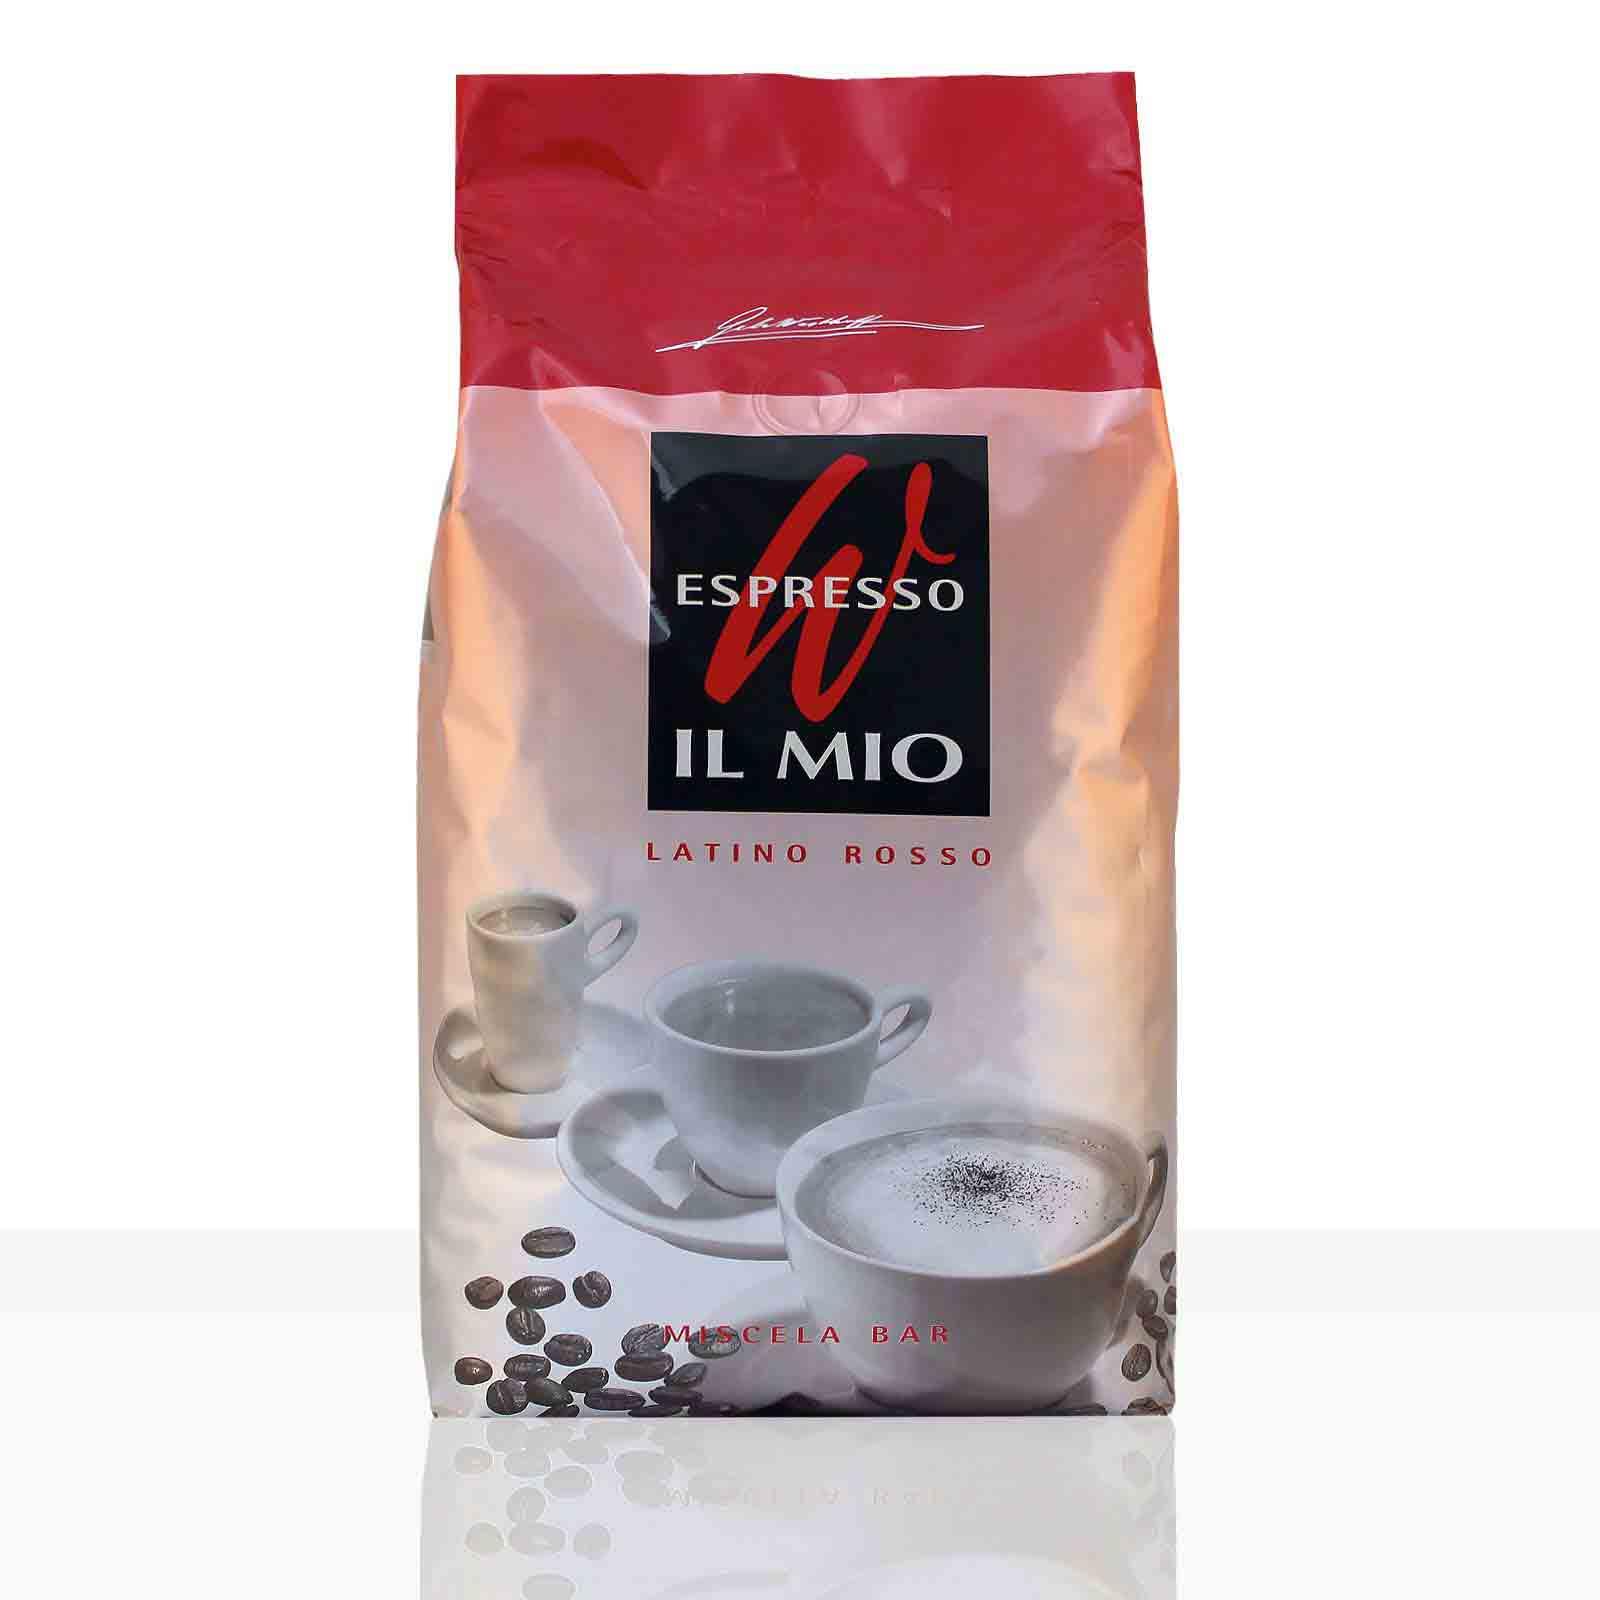 Westhoff Espresso Il Mio Latino Rosso - 1kg ganze Kaffee-Bohne